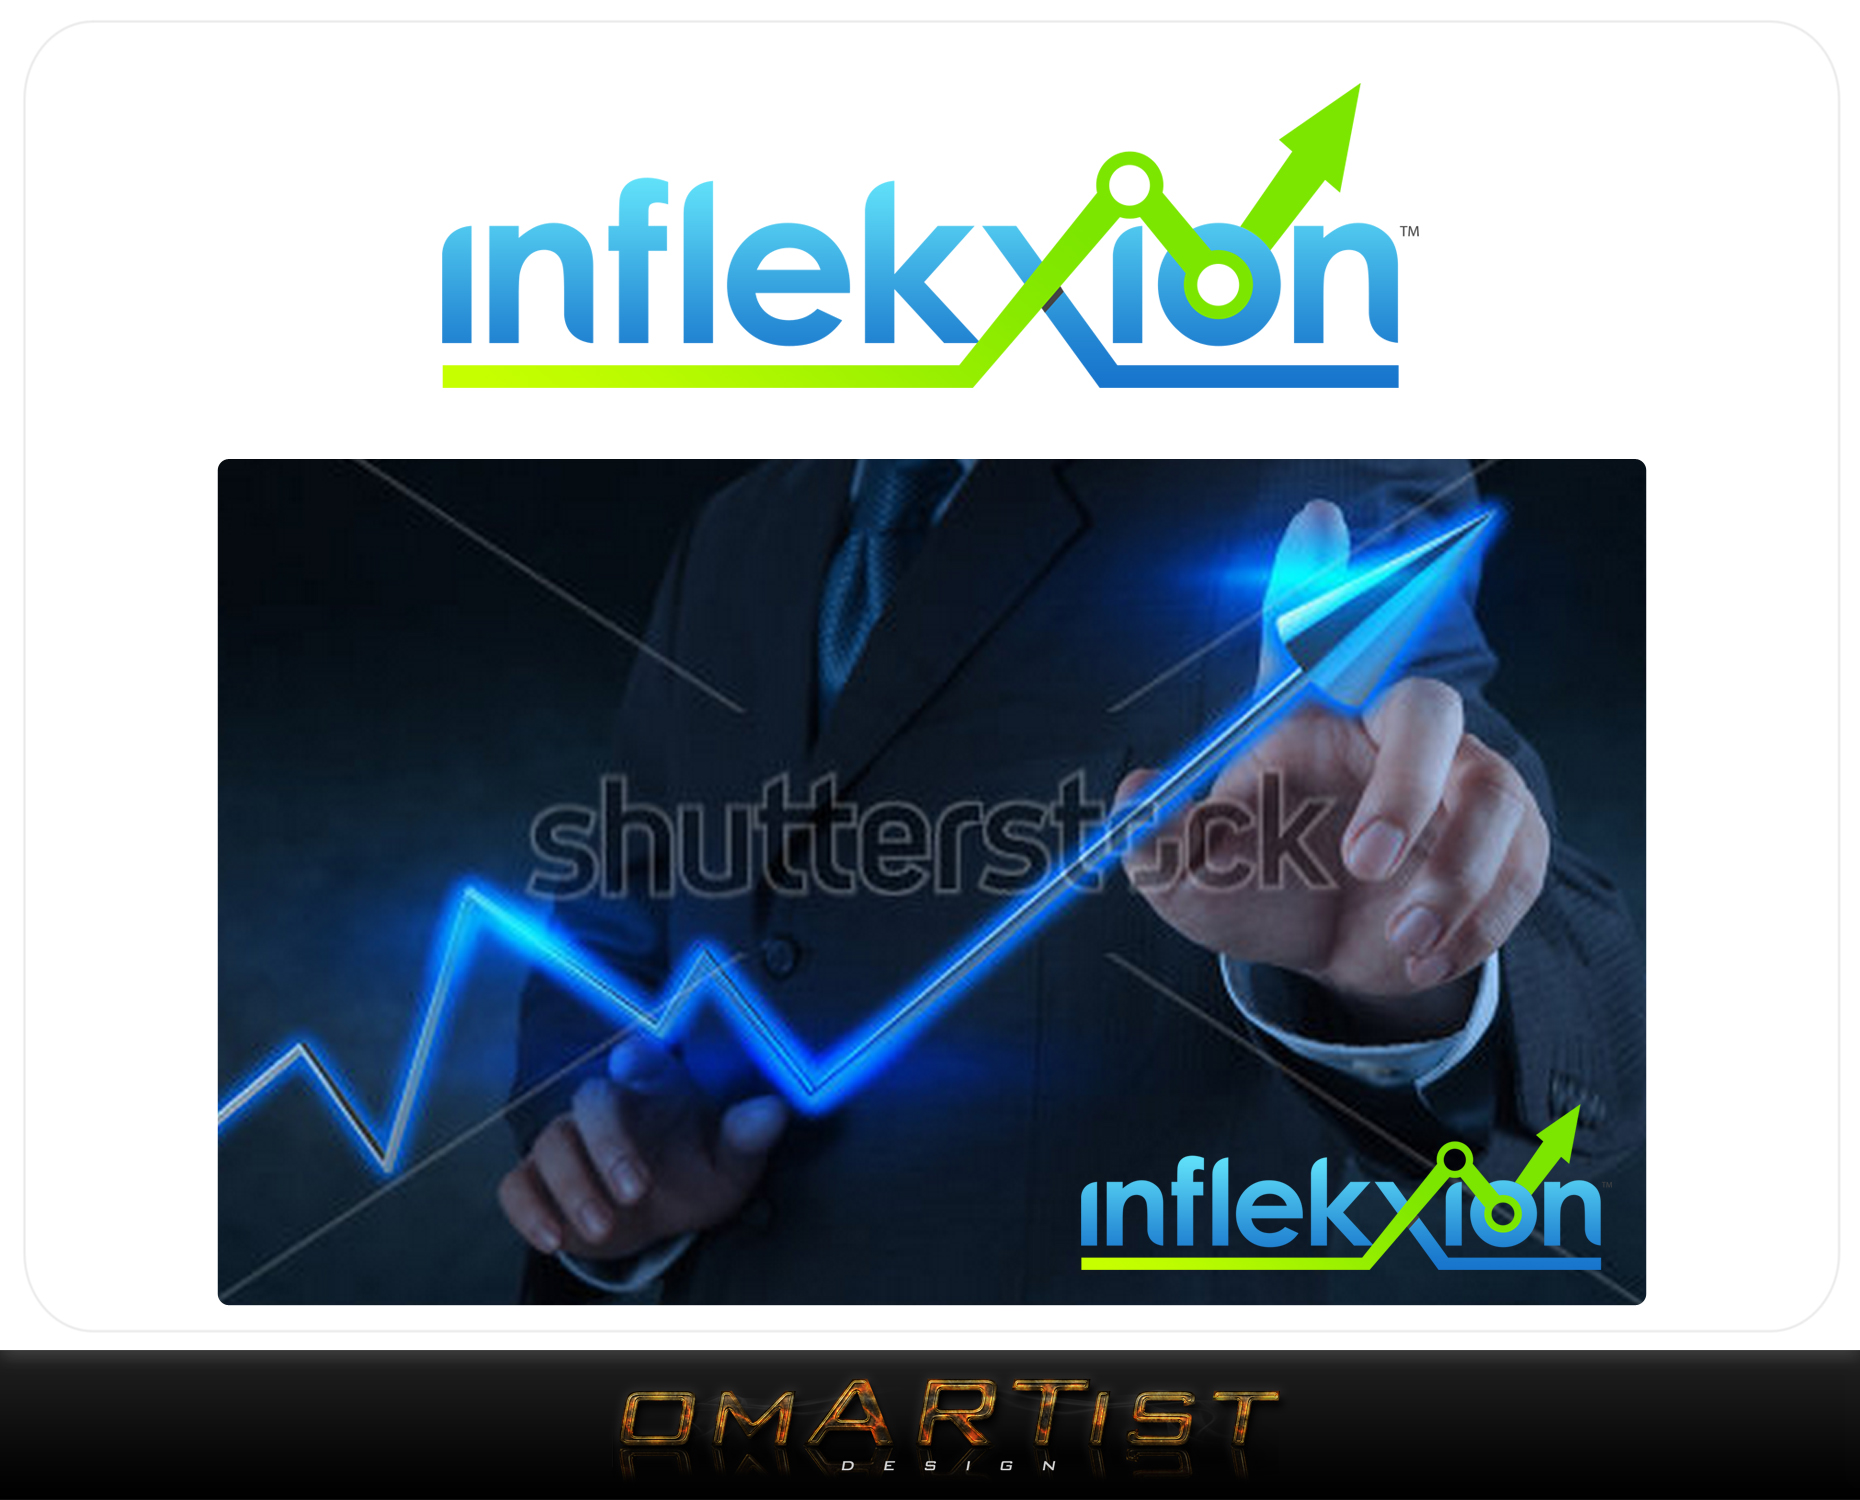 Logo Design by omARTist - Entry No. 202 in the Logo Design Contest Professional Logo Design for Inflekxion.